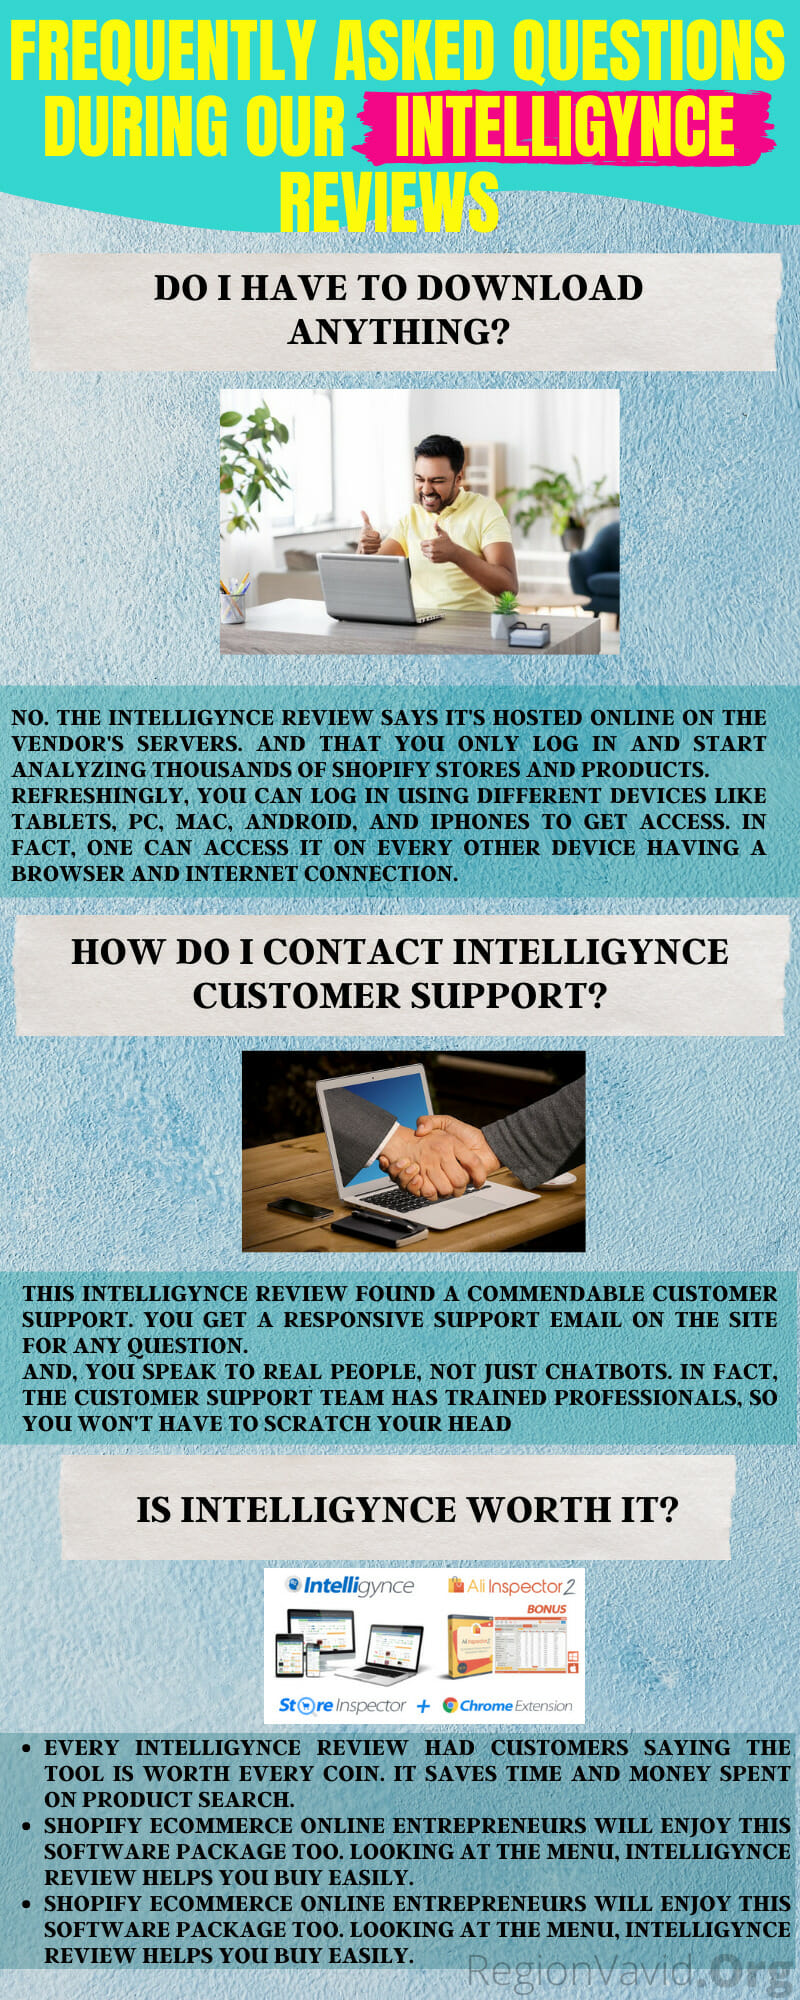 Intelligynce Benefits